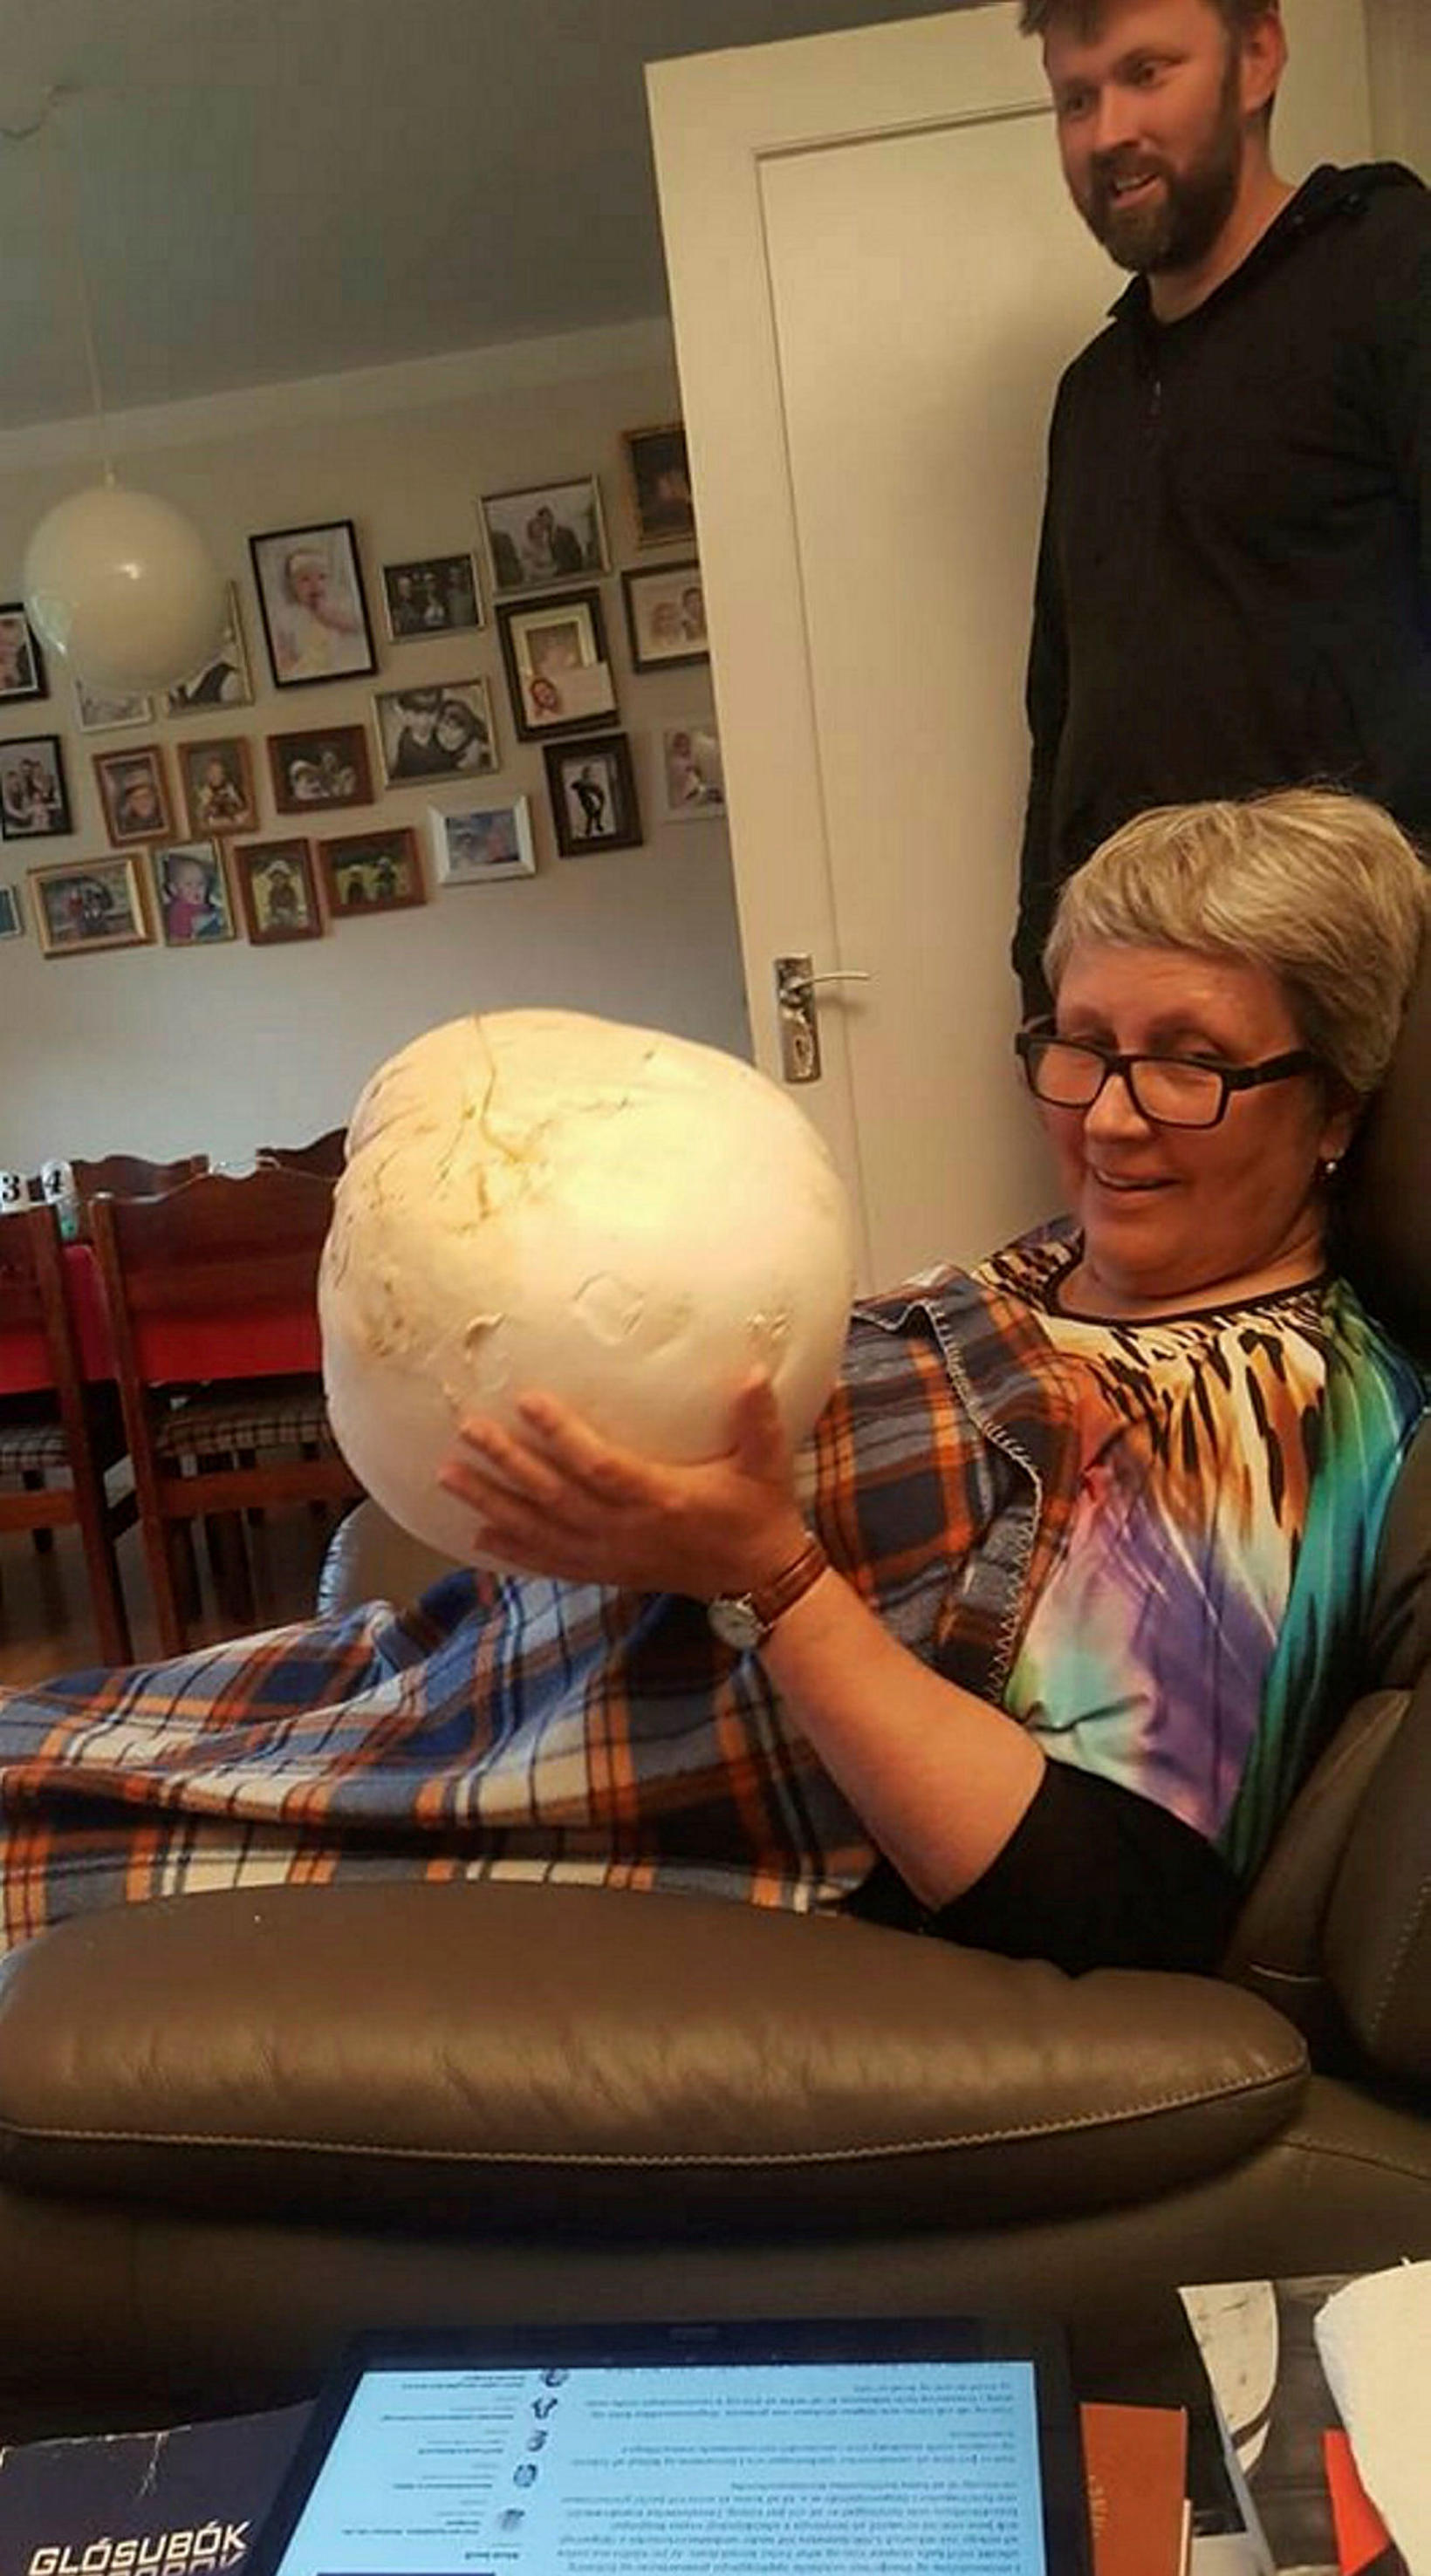 Þórunnborg Jónsdóttir, holding the giant puffball.